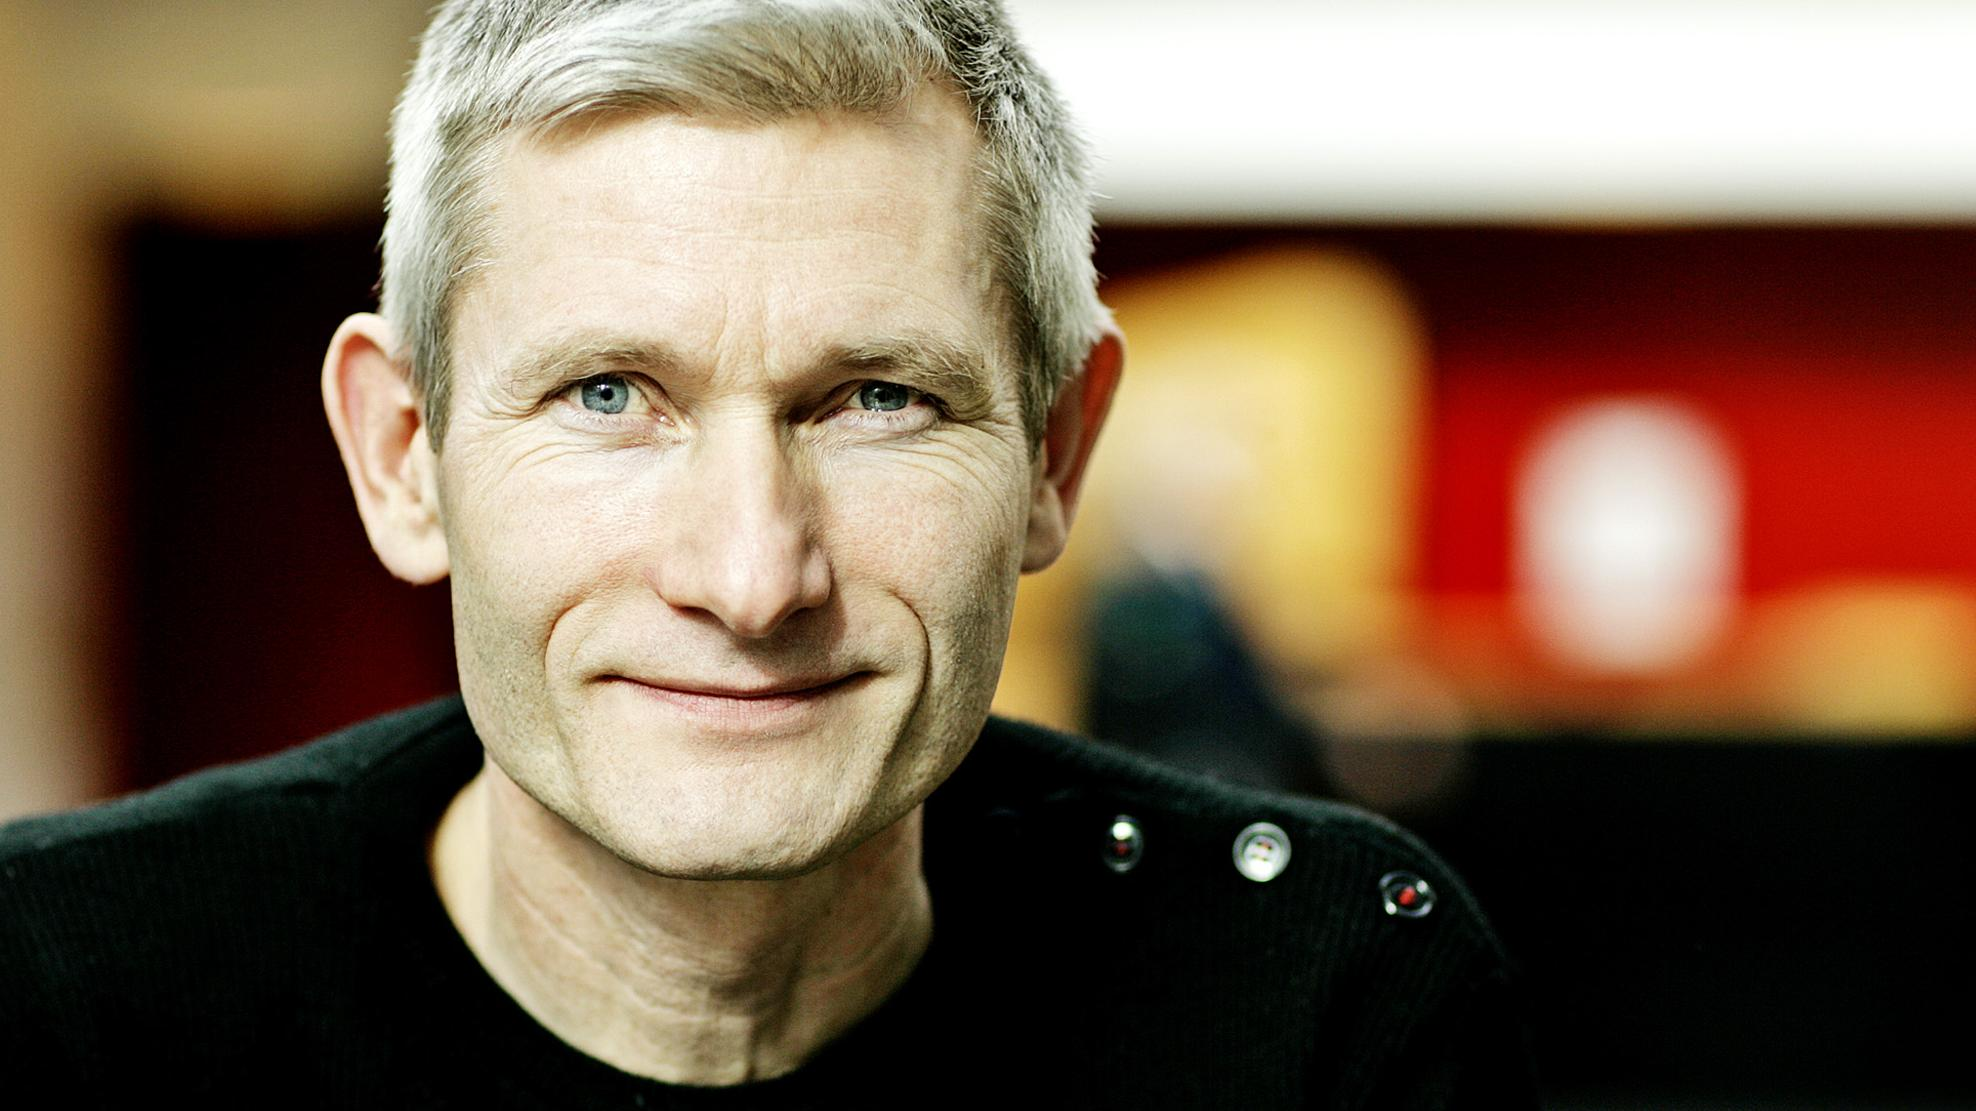 Carsten Wolf Andersen